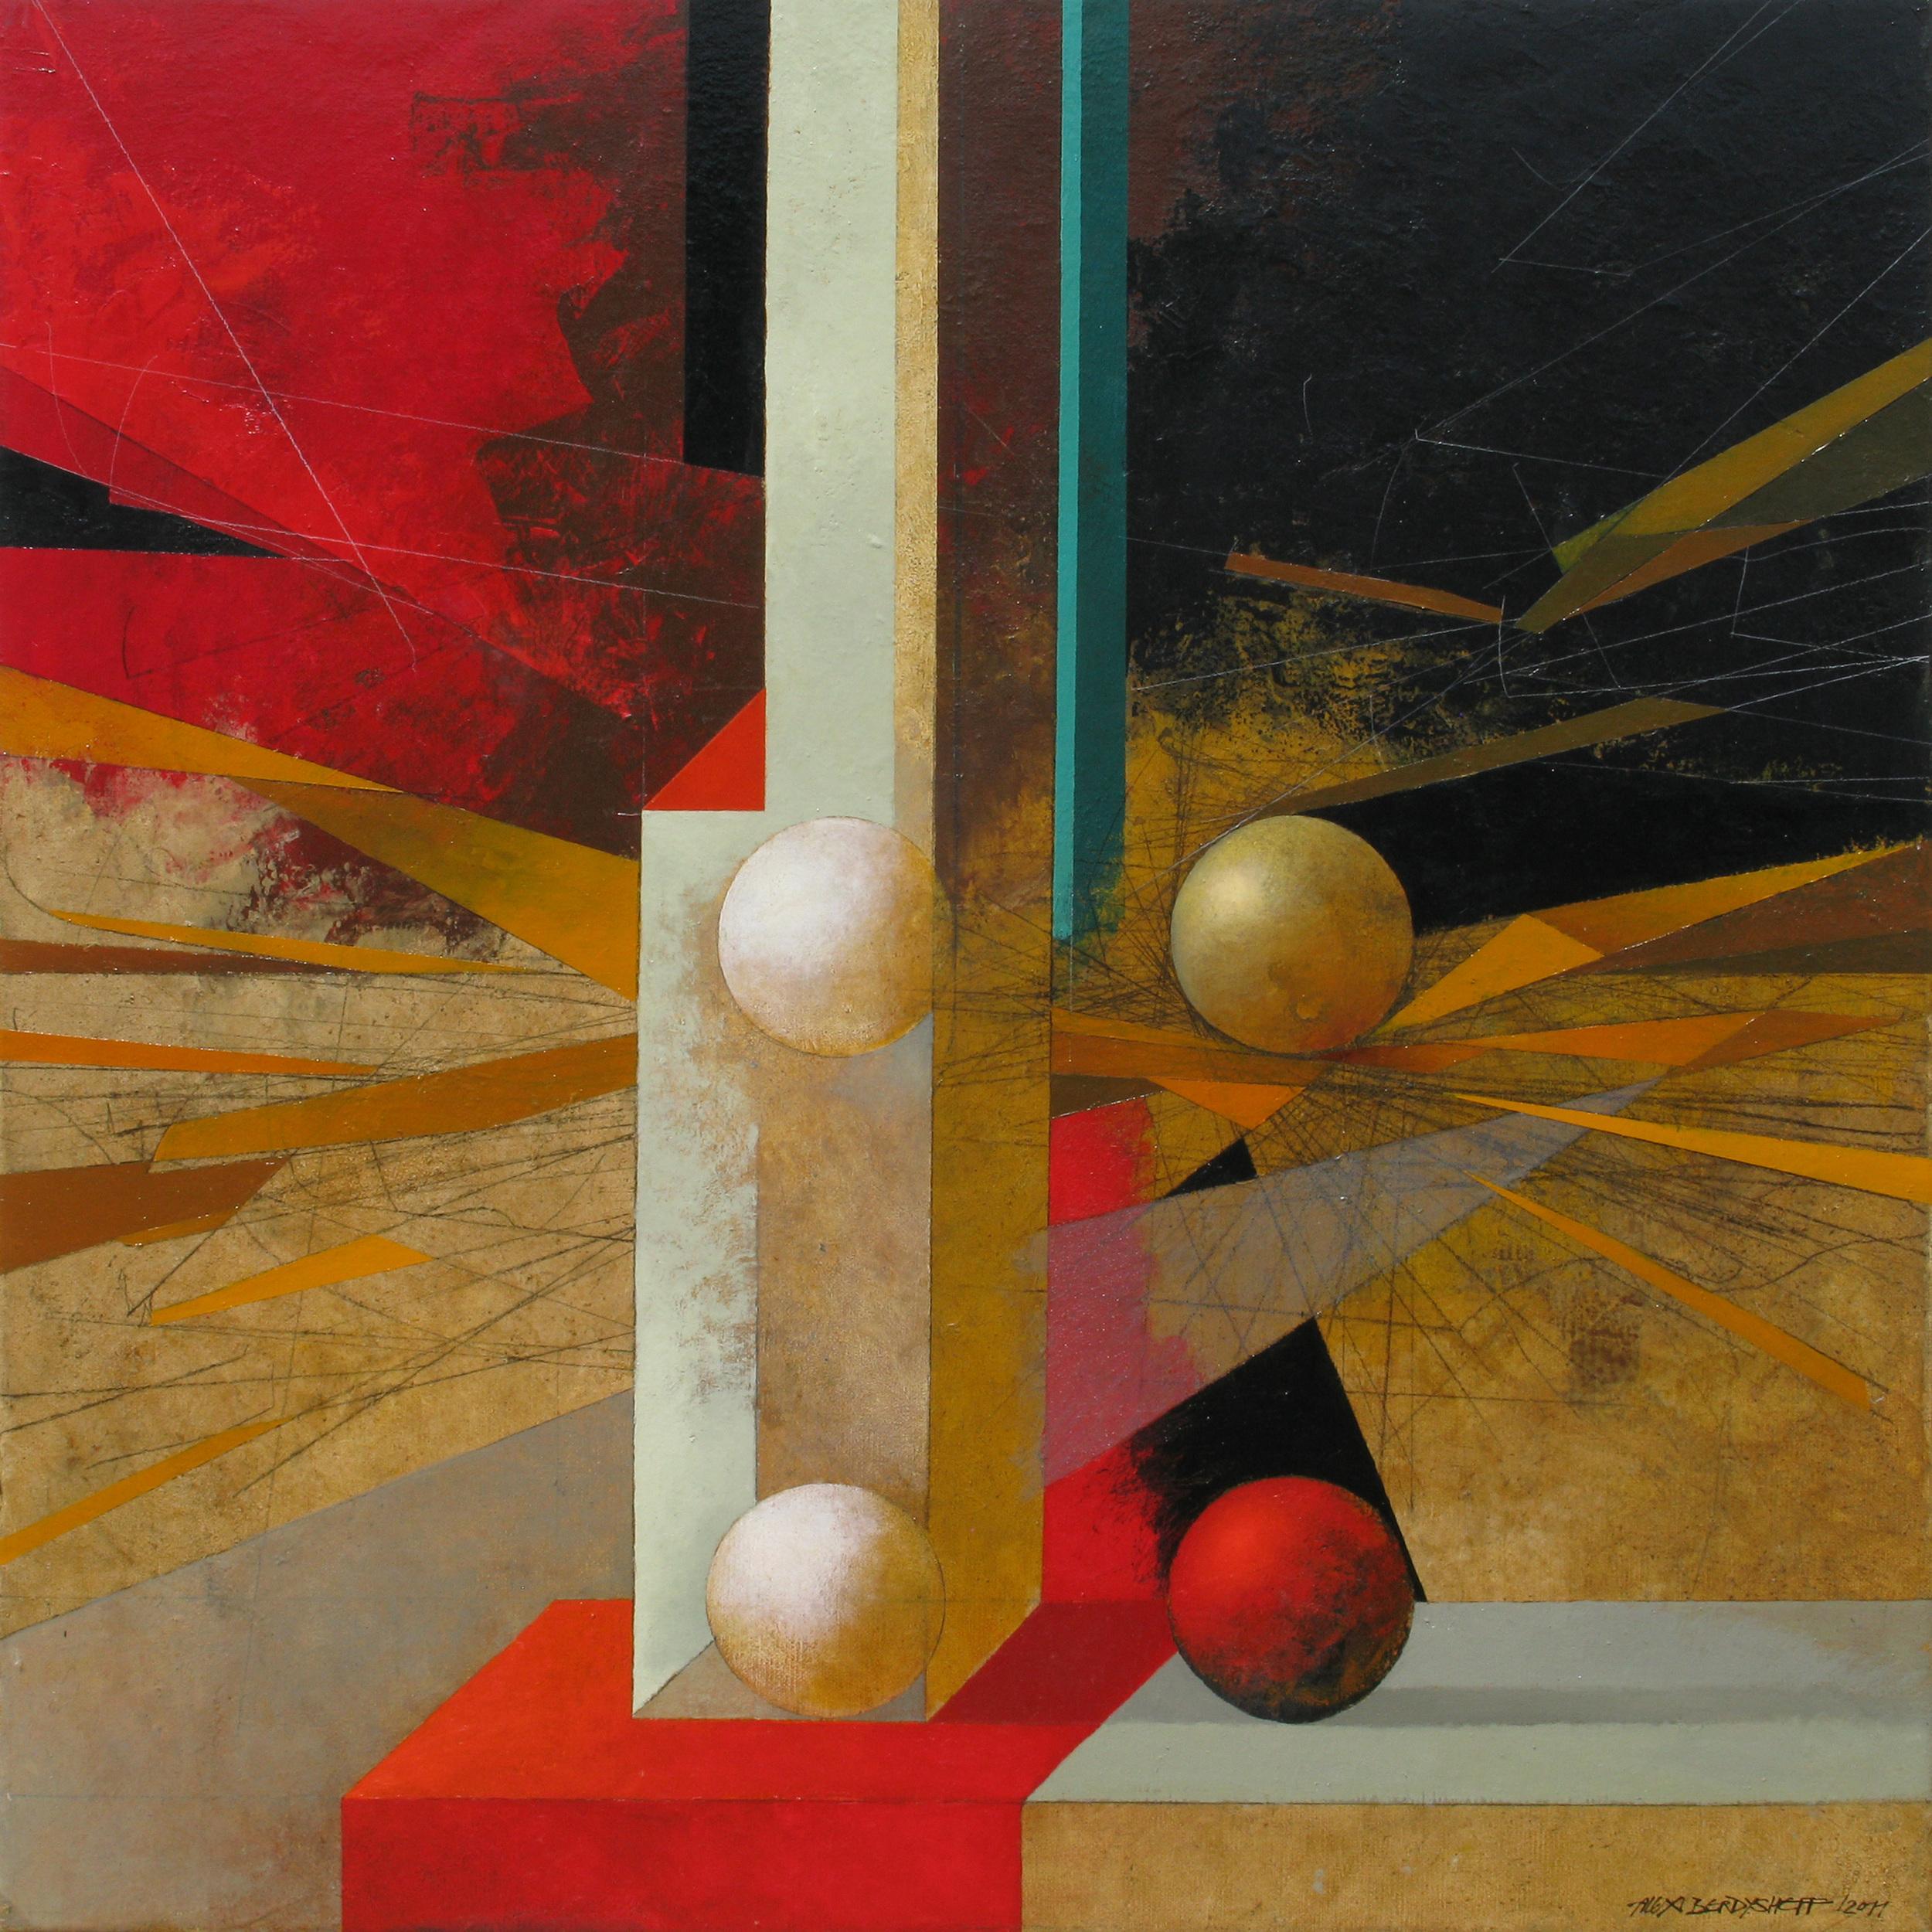 Metaphysical Still-life, oil on canvas, 85x85 cm, 2011